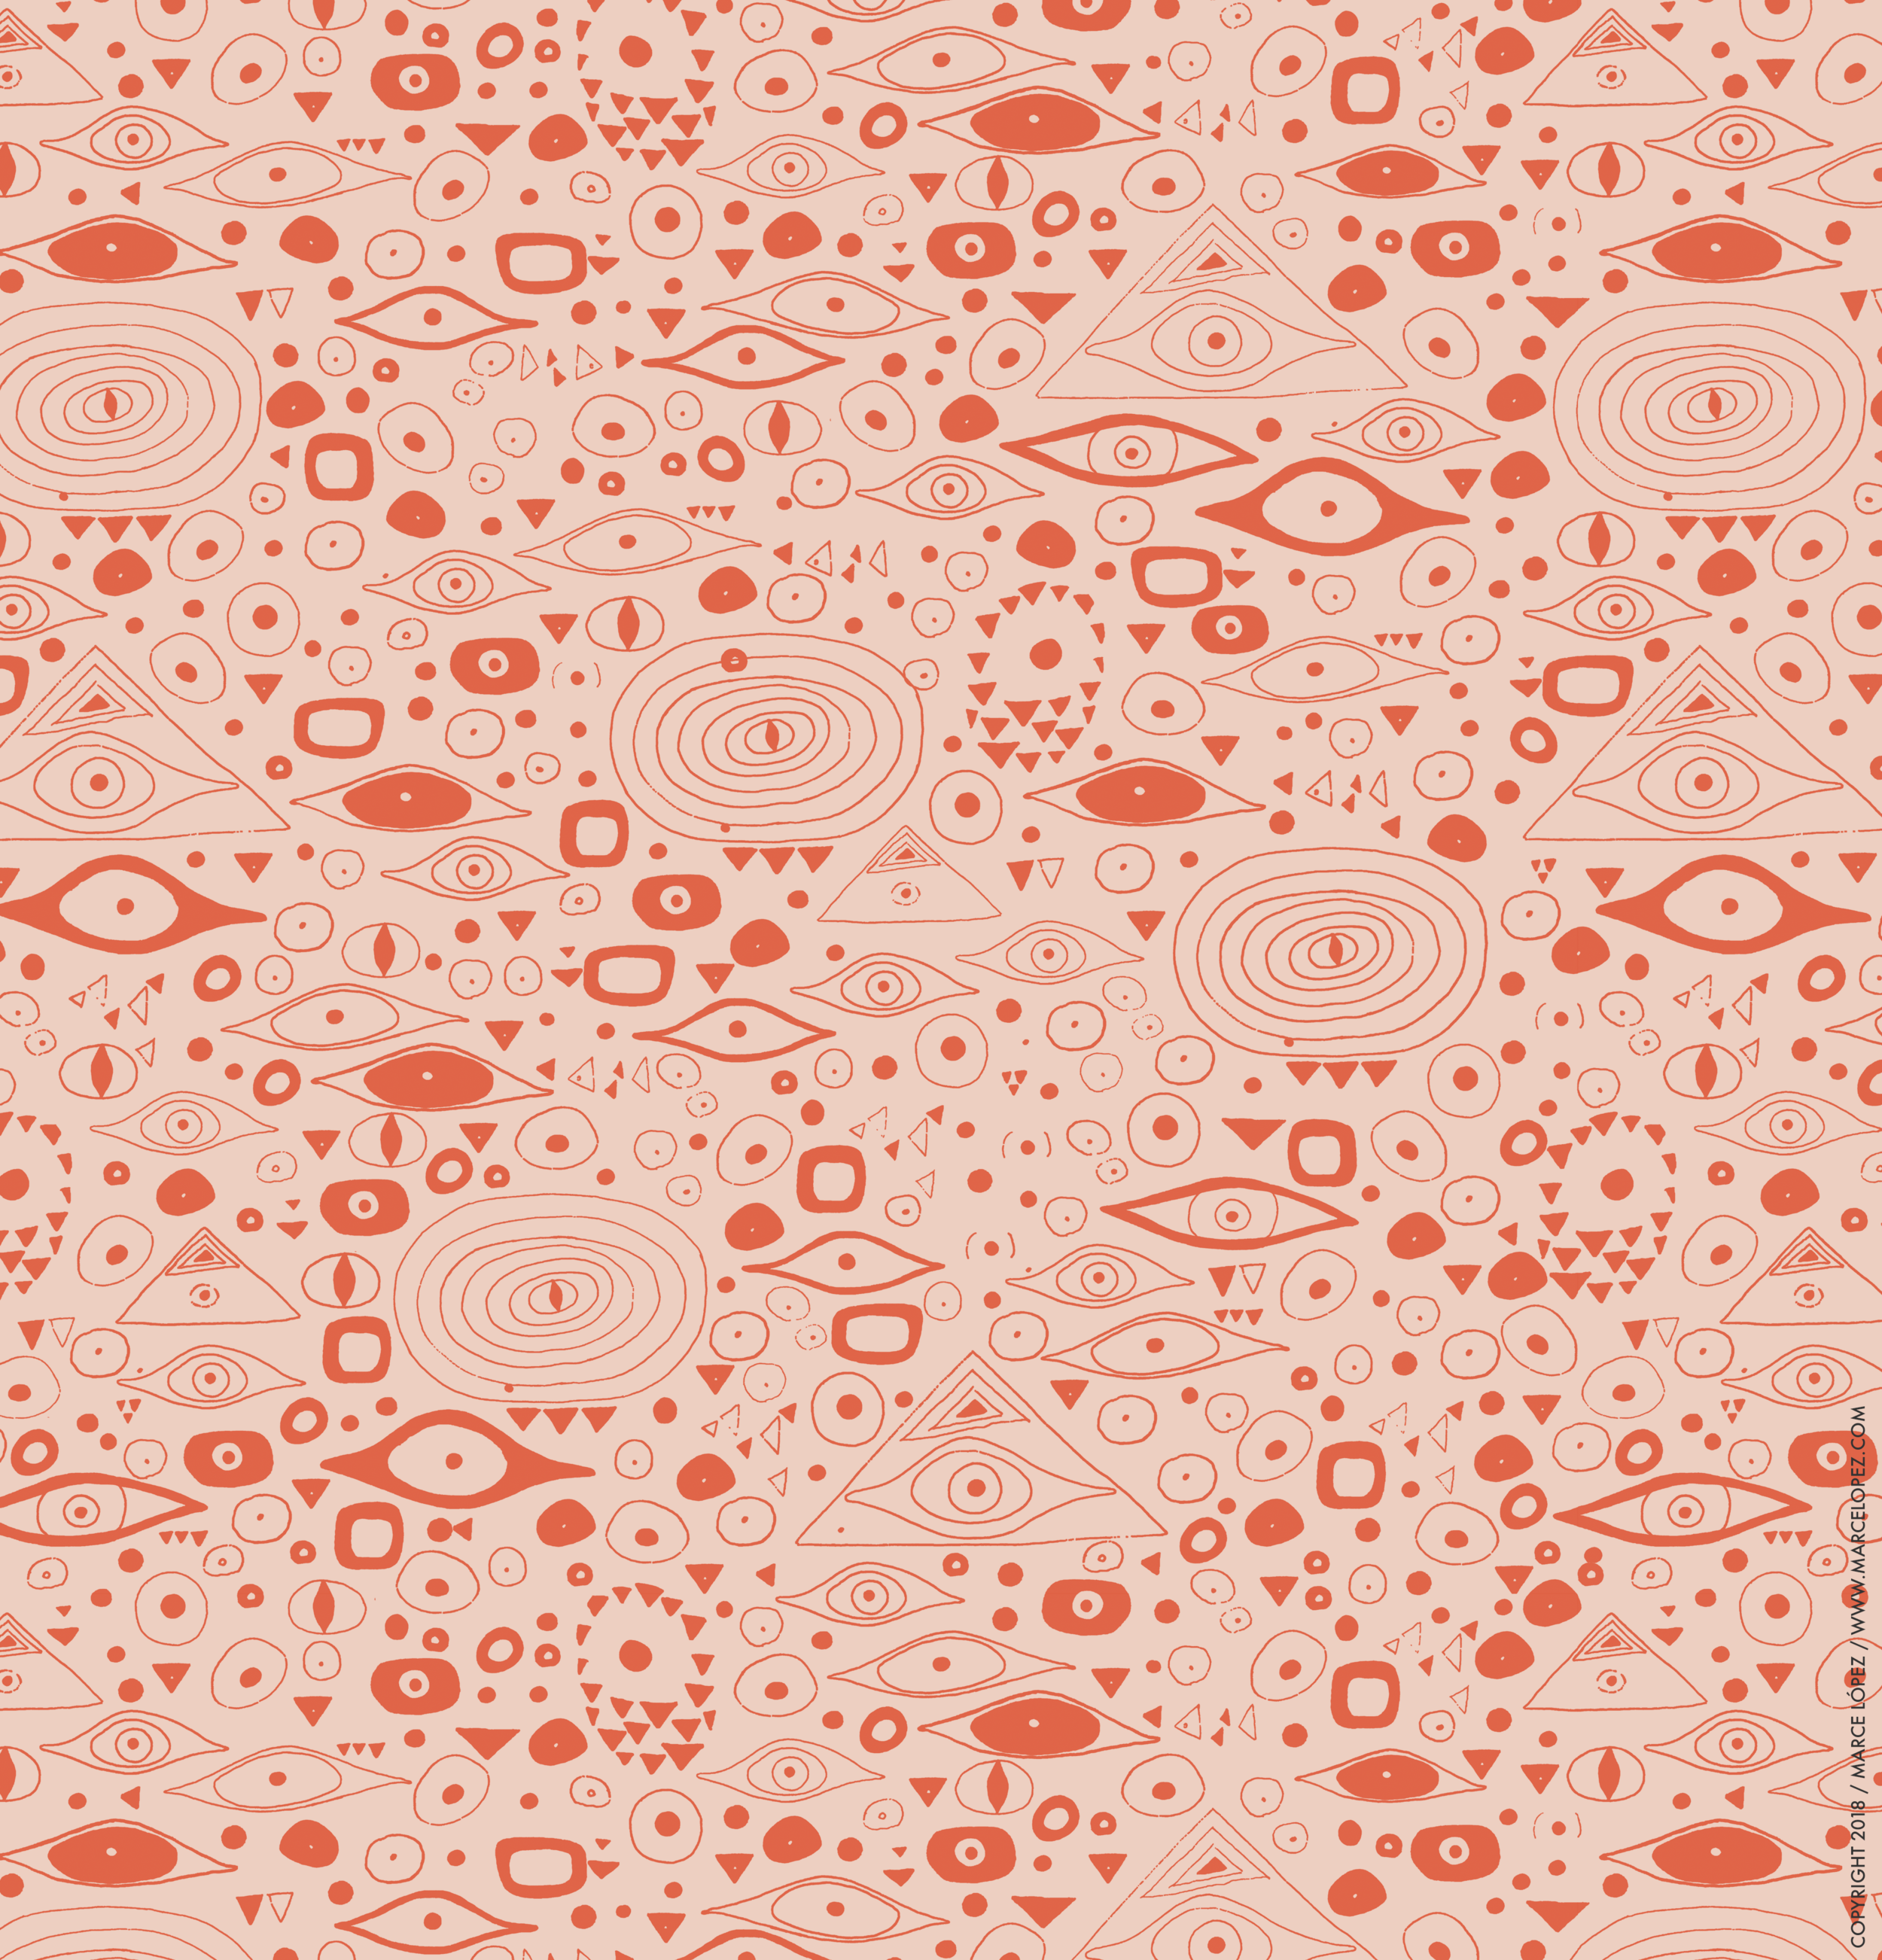 eyesgeometric_red.png